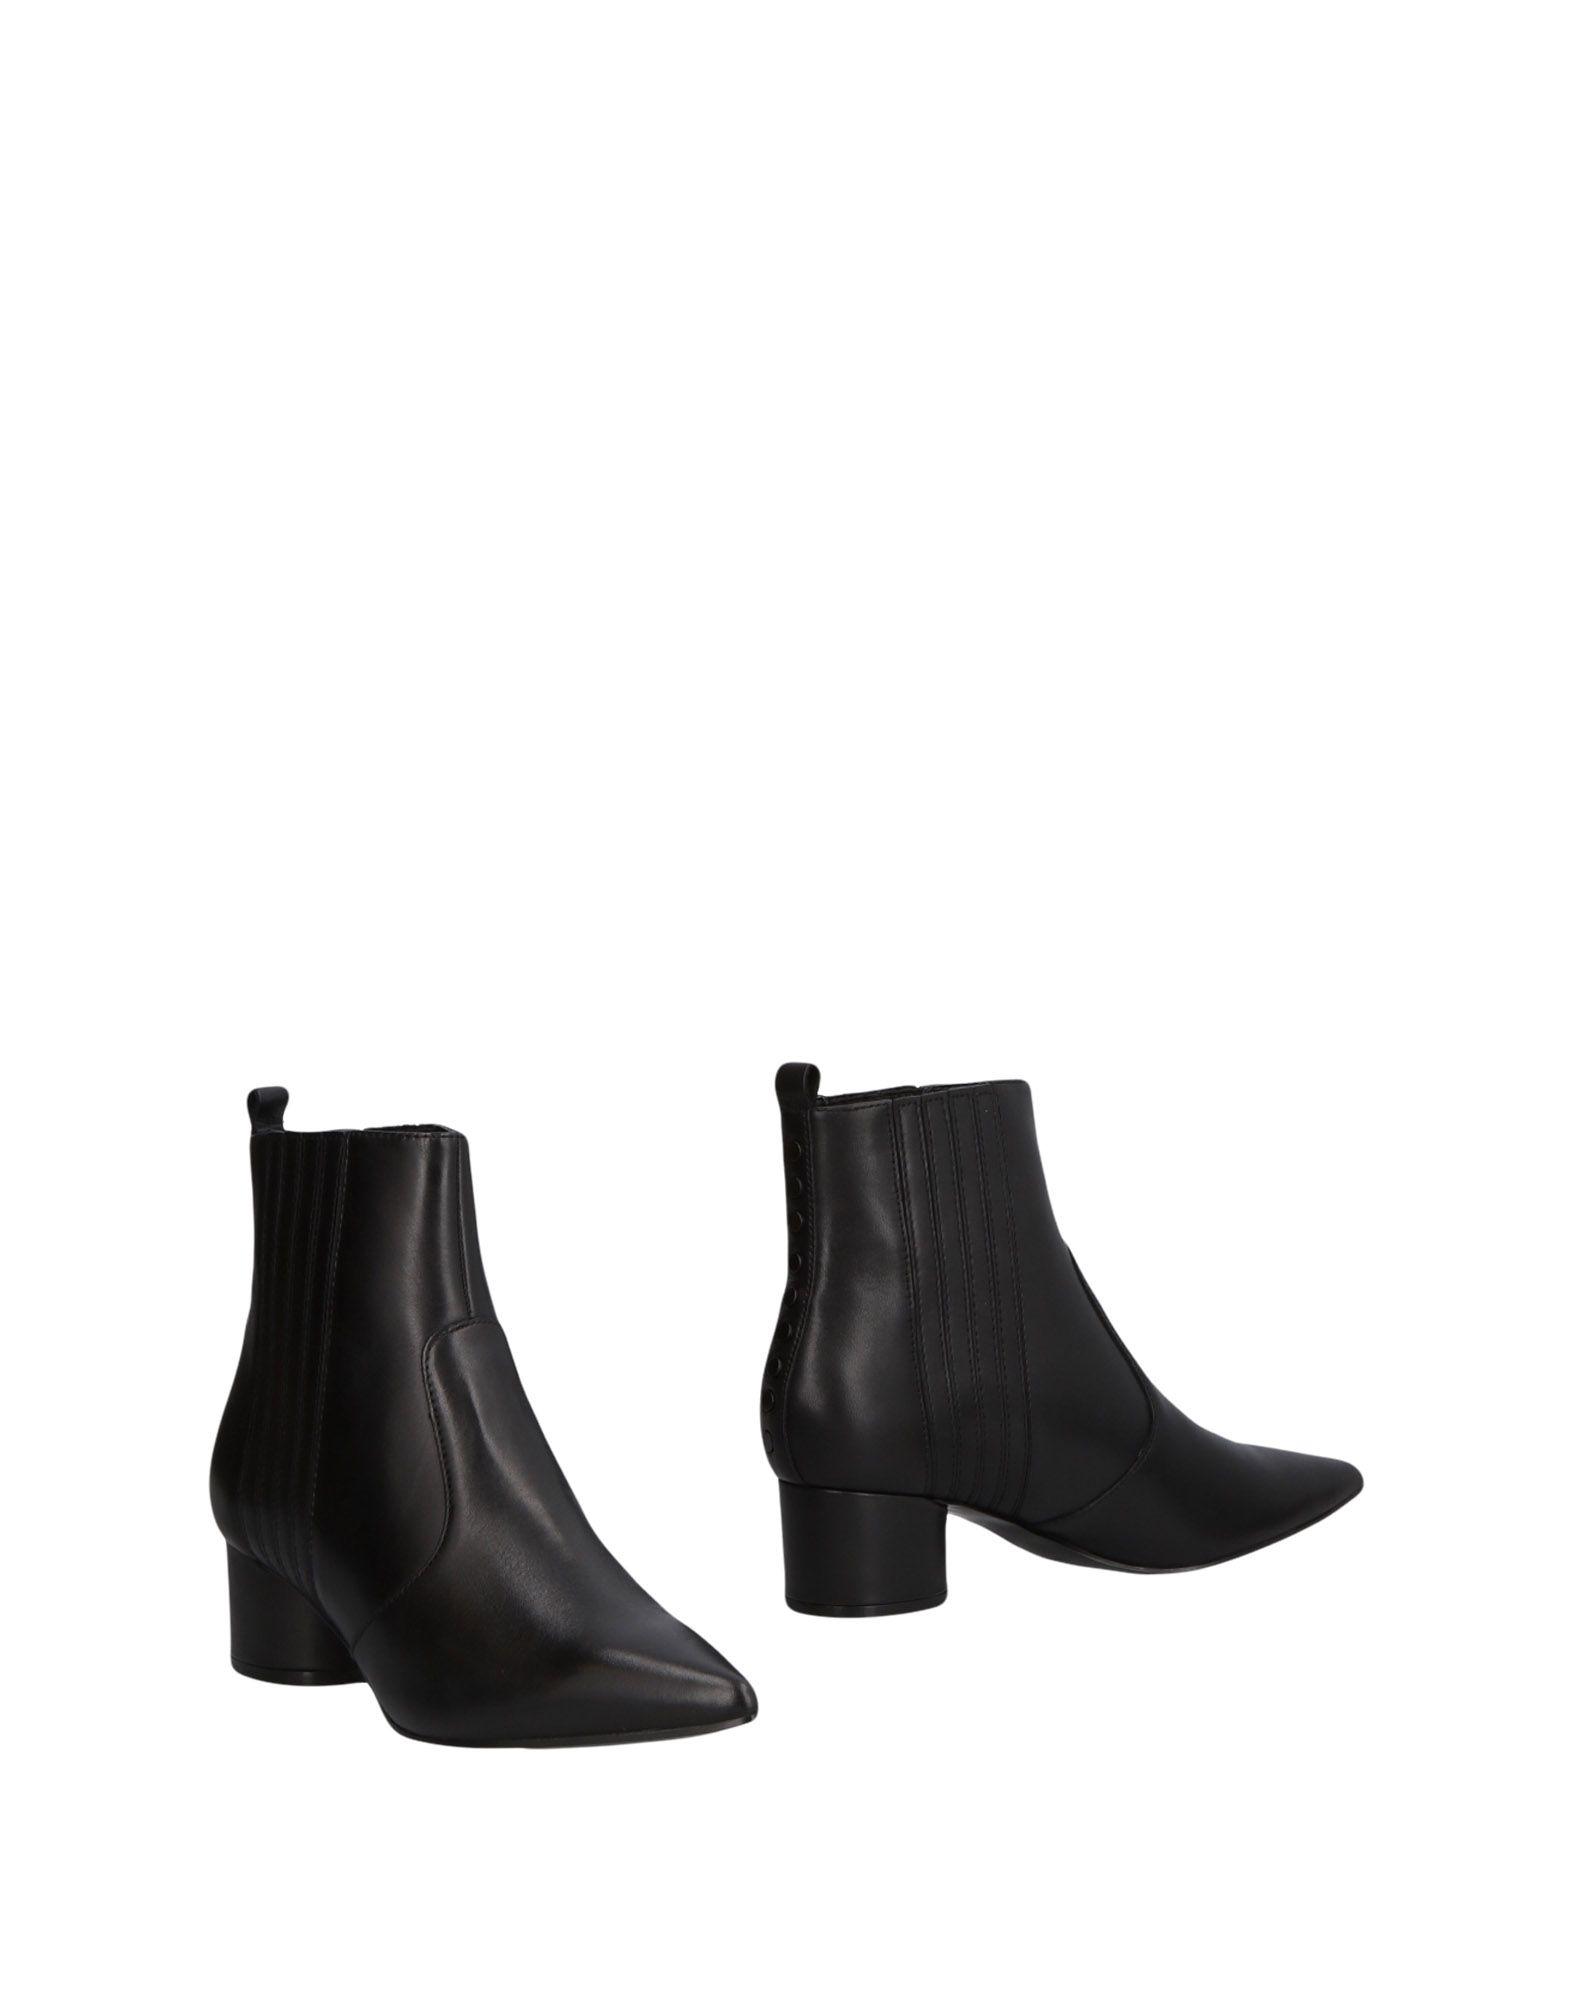 Kendall Stiefelette + Kylie Stiefelette Kendall Damen  11482708UI Neue Schuhe f5b24a